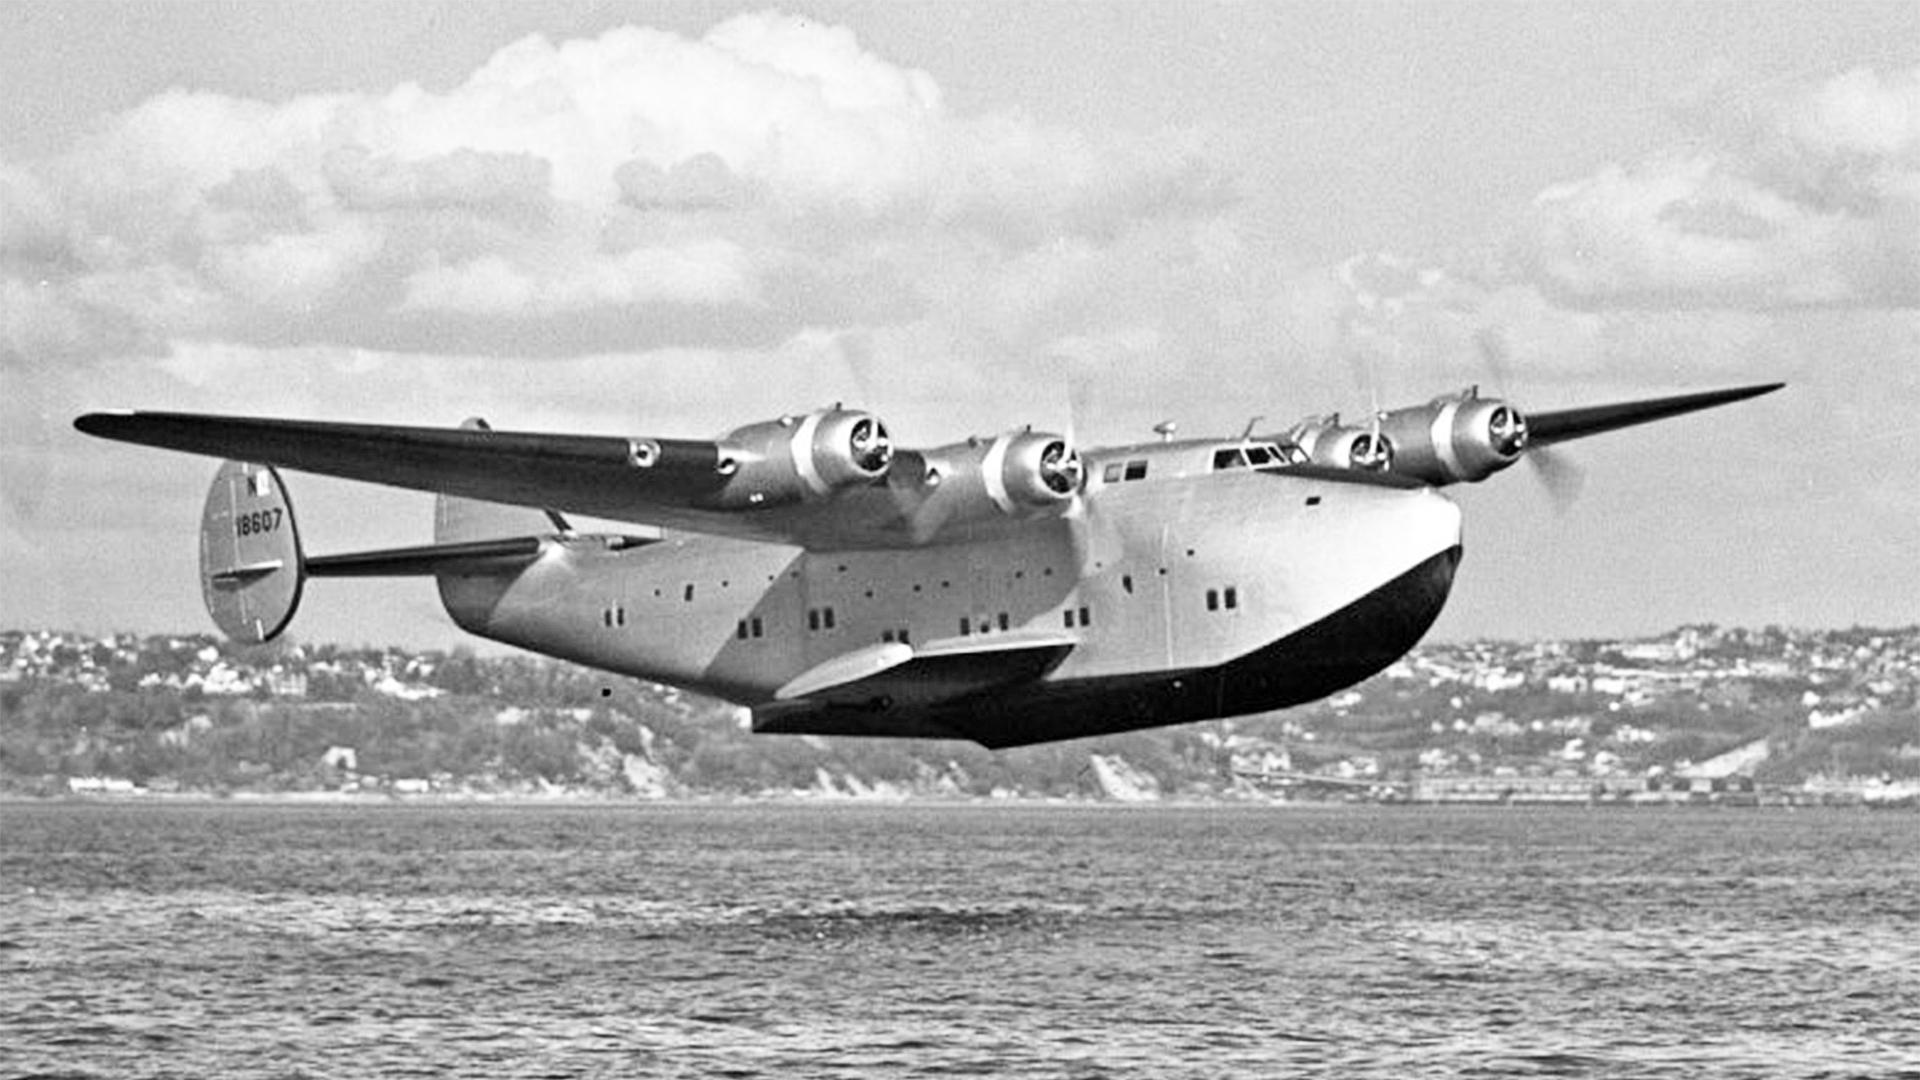 Boeing 314 Clipper - podróż w wielkim stylu by LONG STORY SHORT